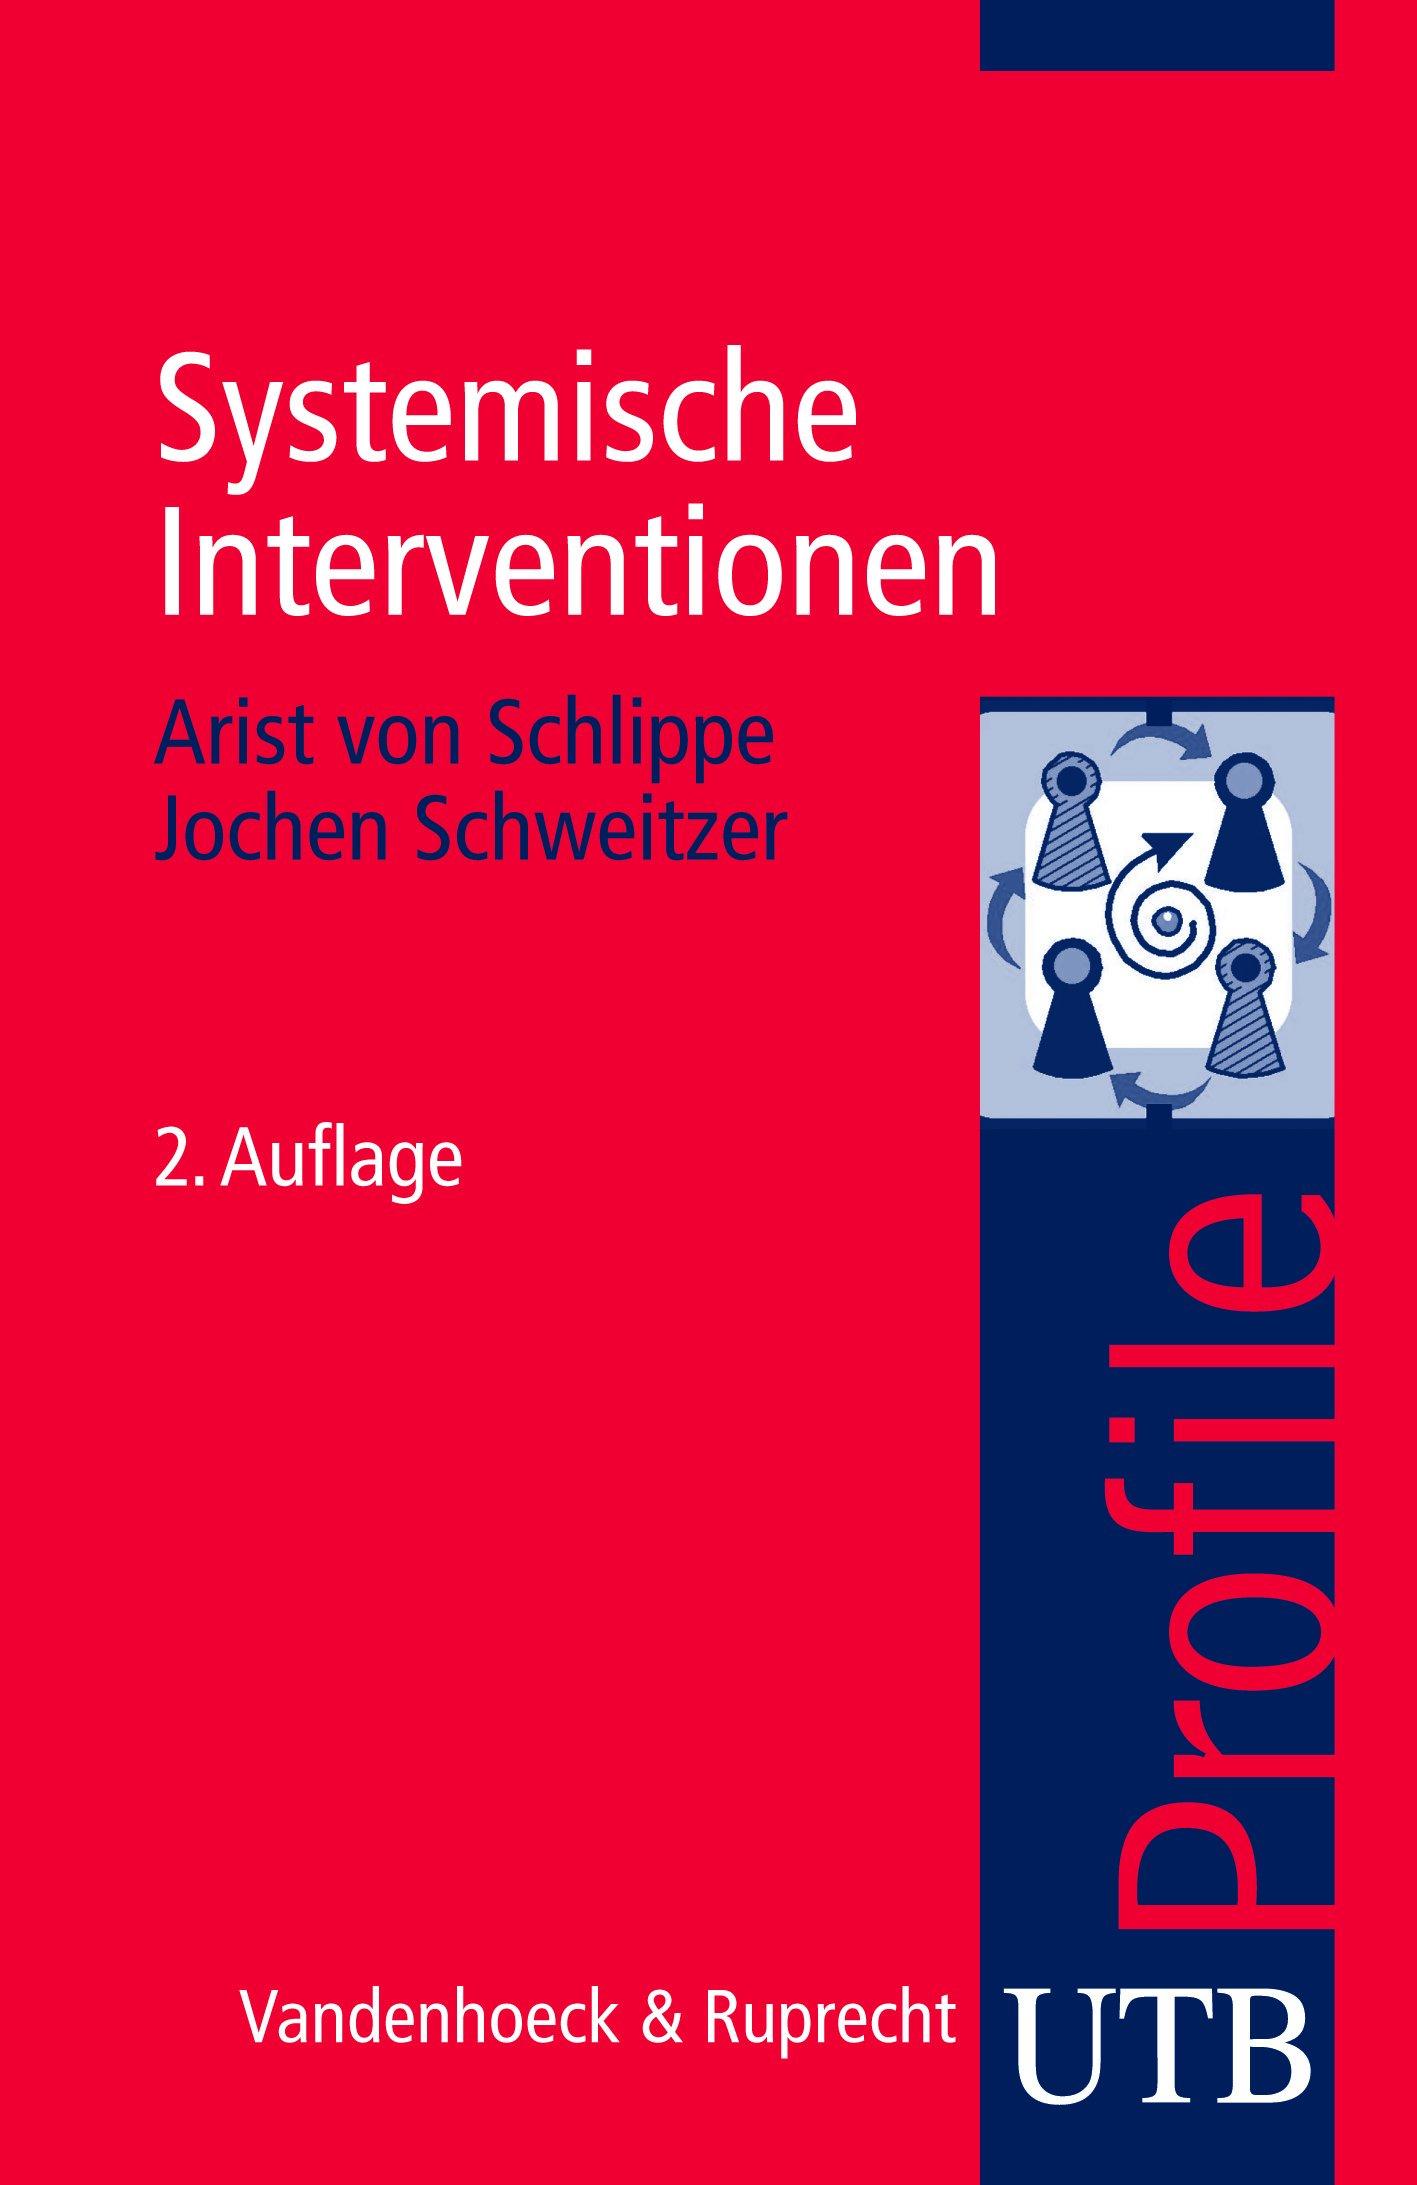 systemische-interventionen-utb-profile-band-3313